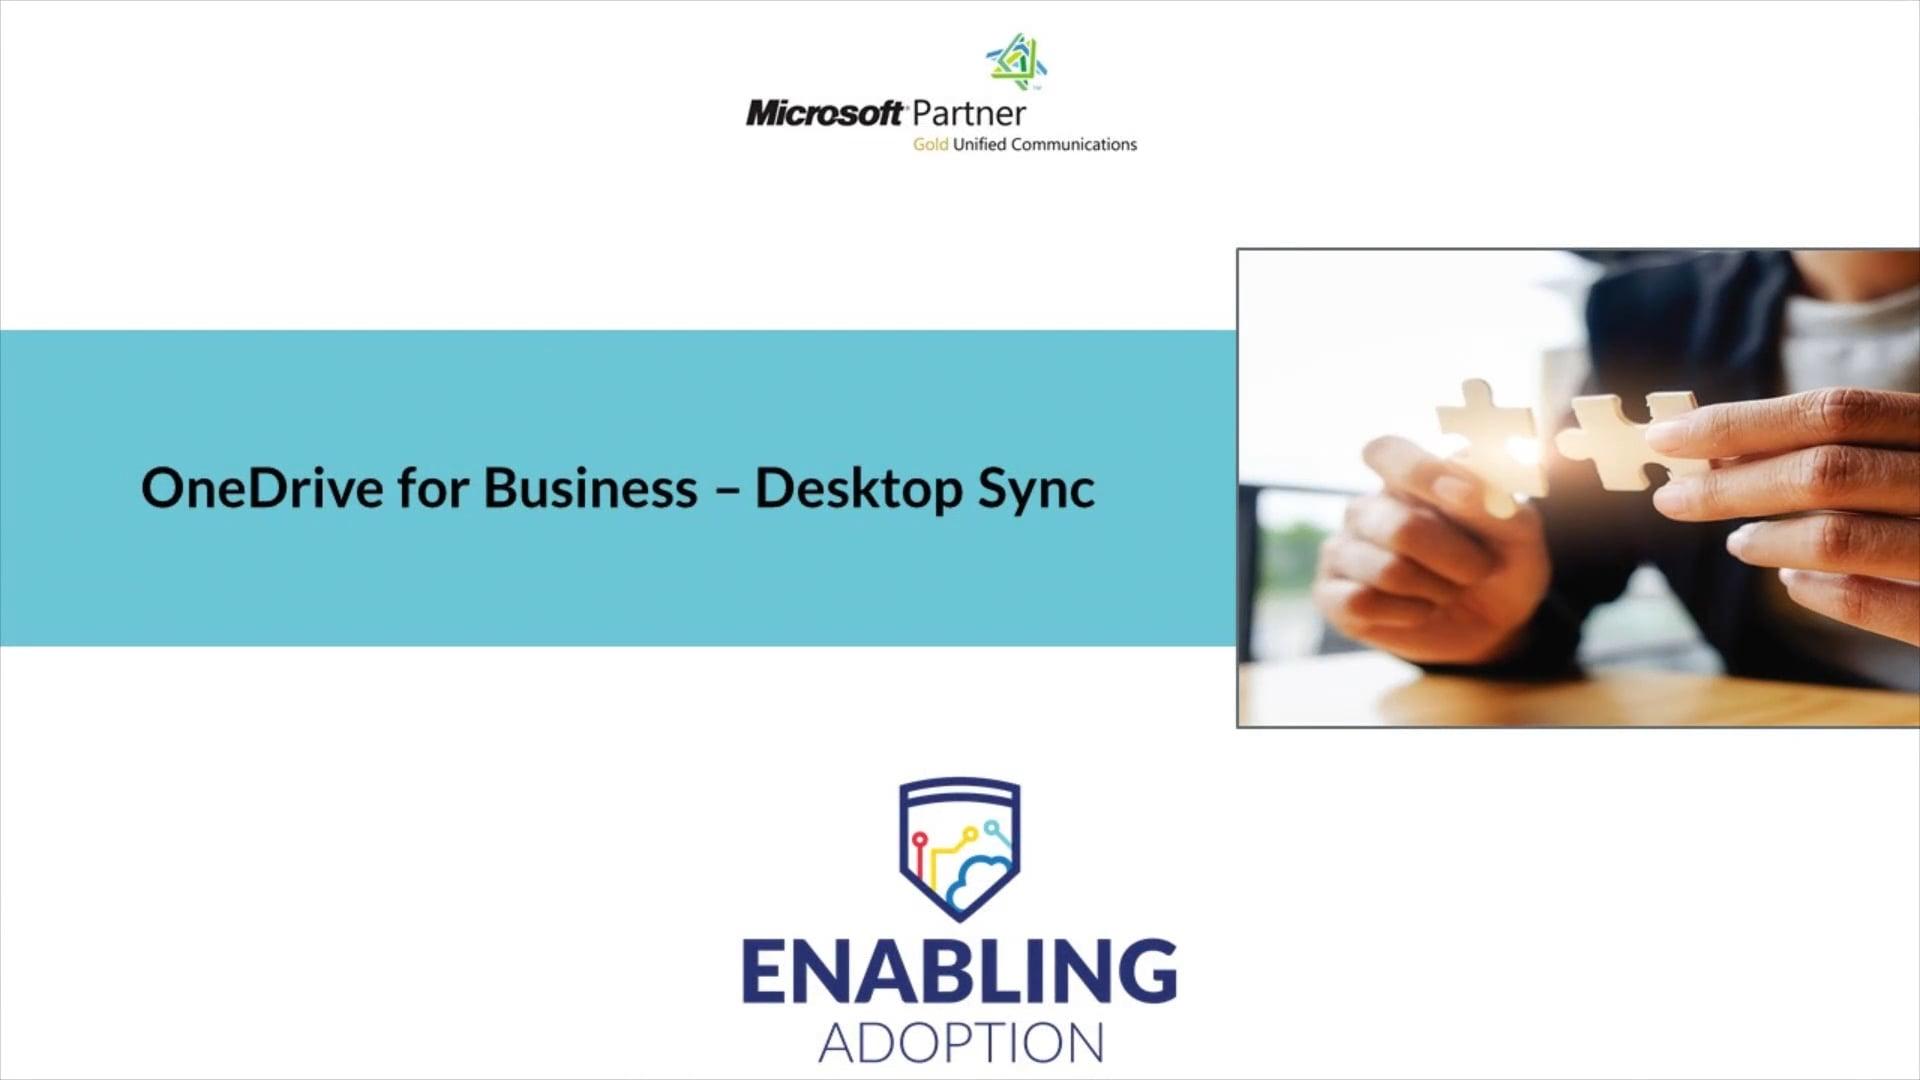 OneDrive for Business - Desktop Sync